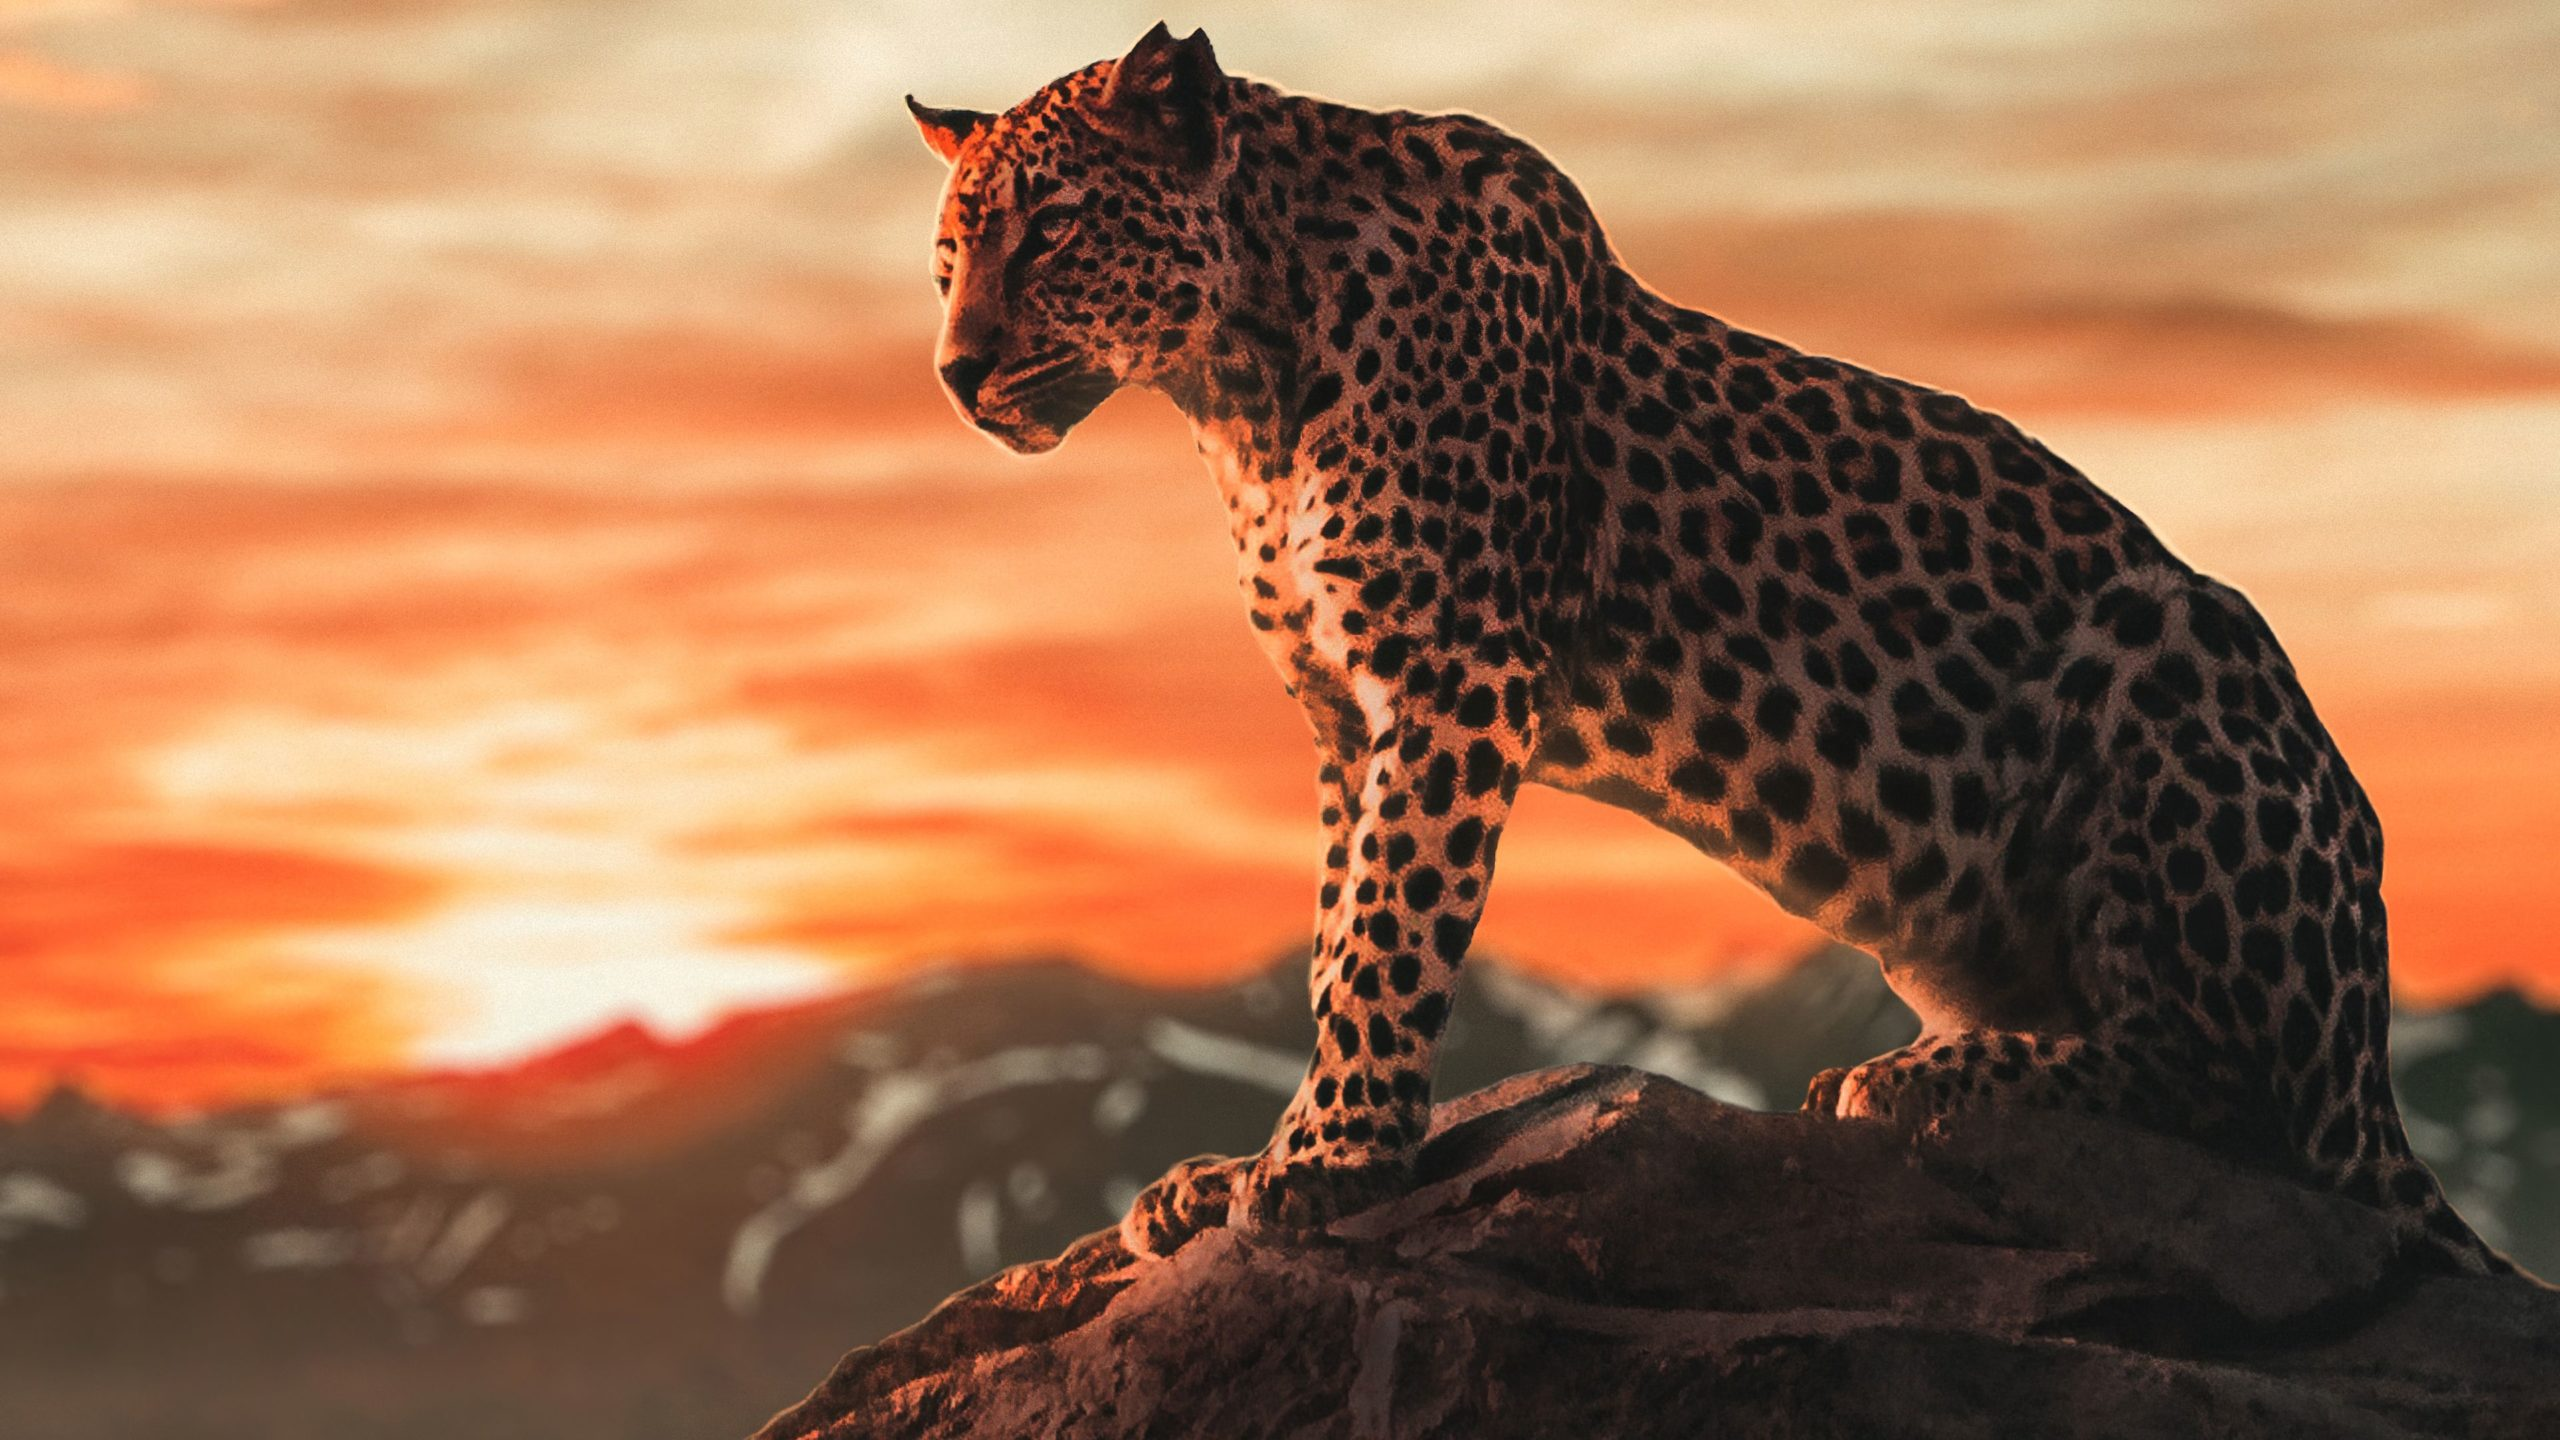 cheetah running images